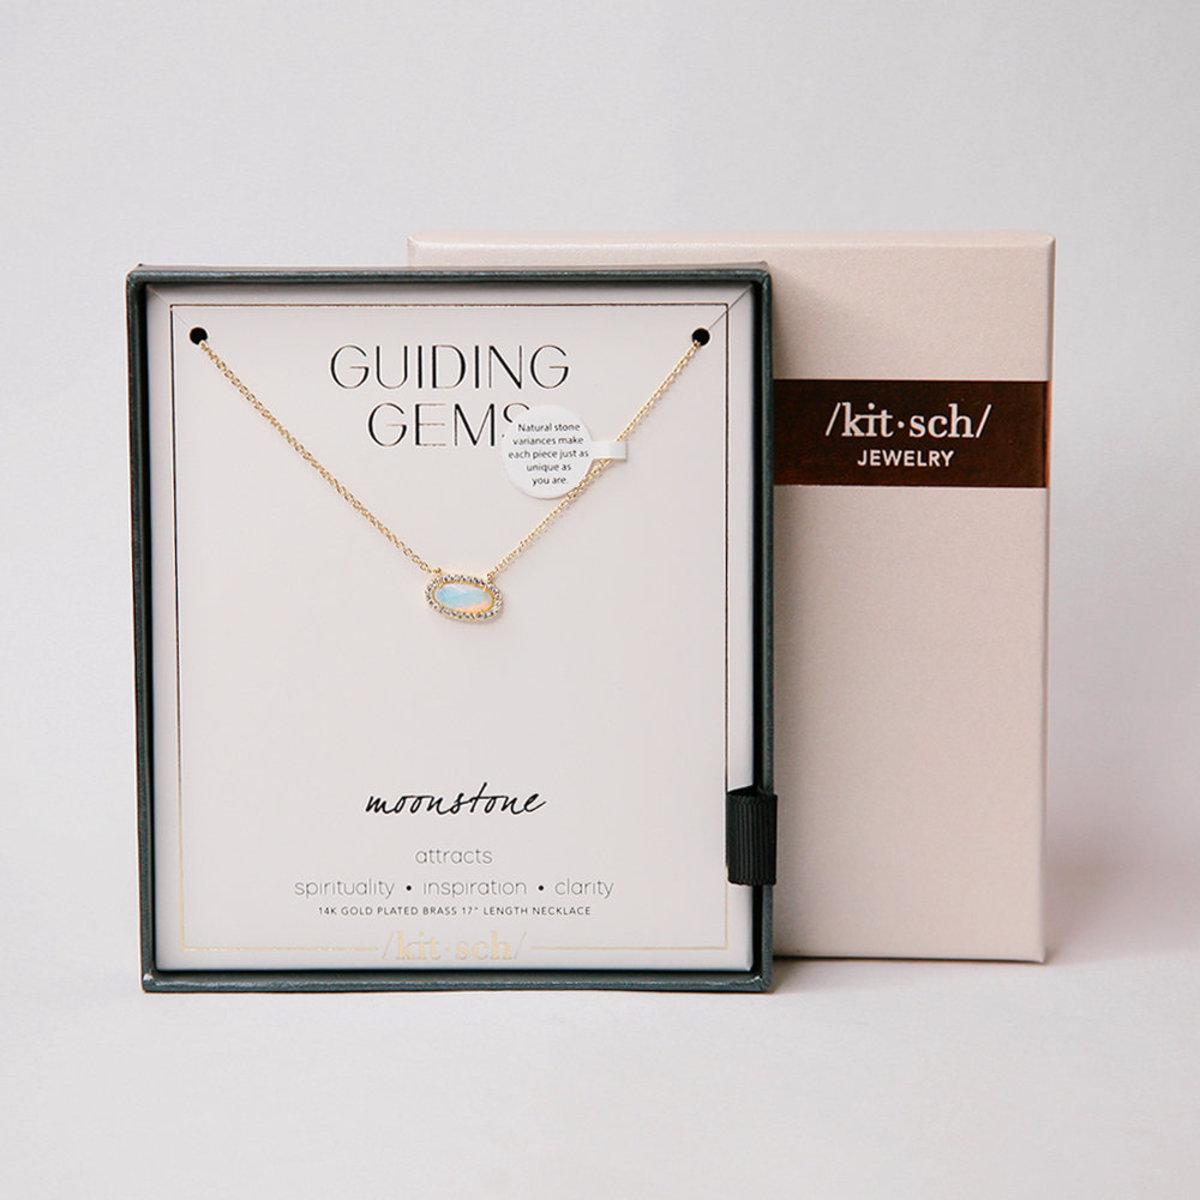 14K金月亮石項鍊 | 禮物推薦  | 生日禮物